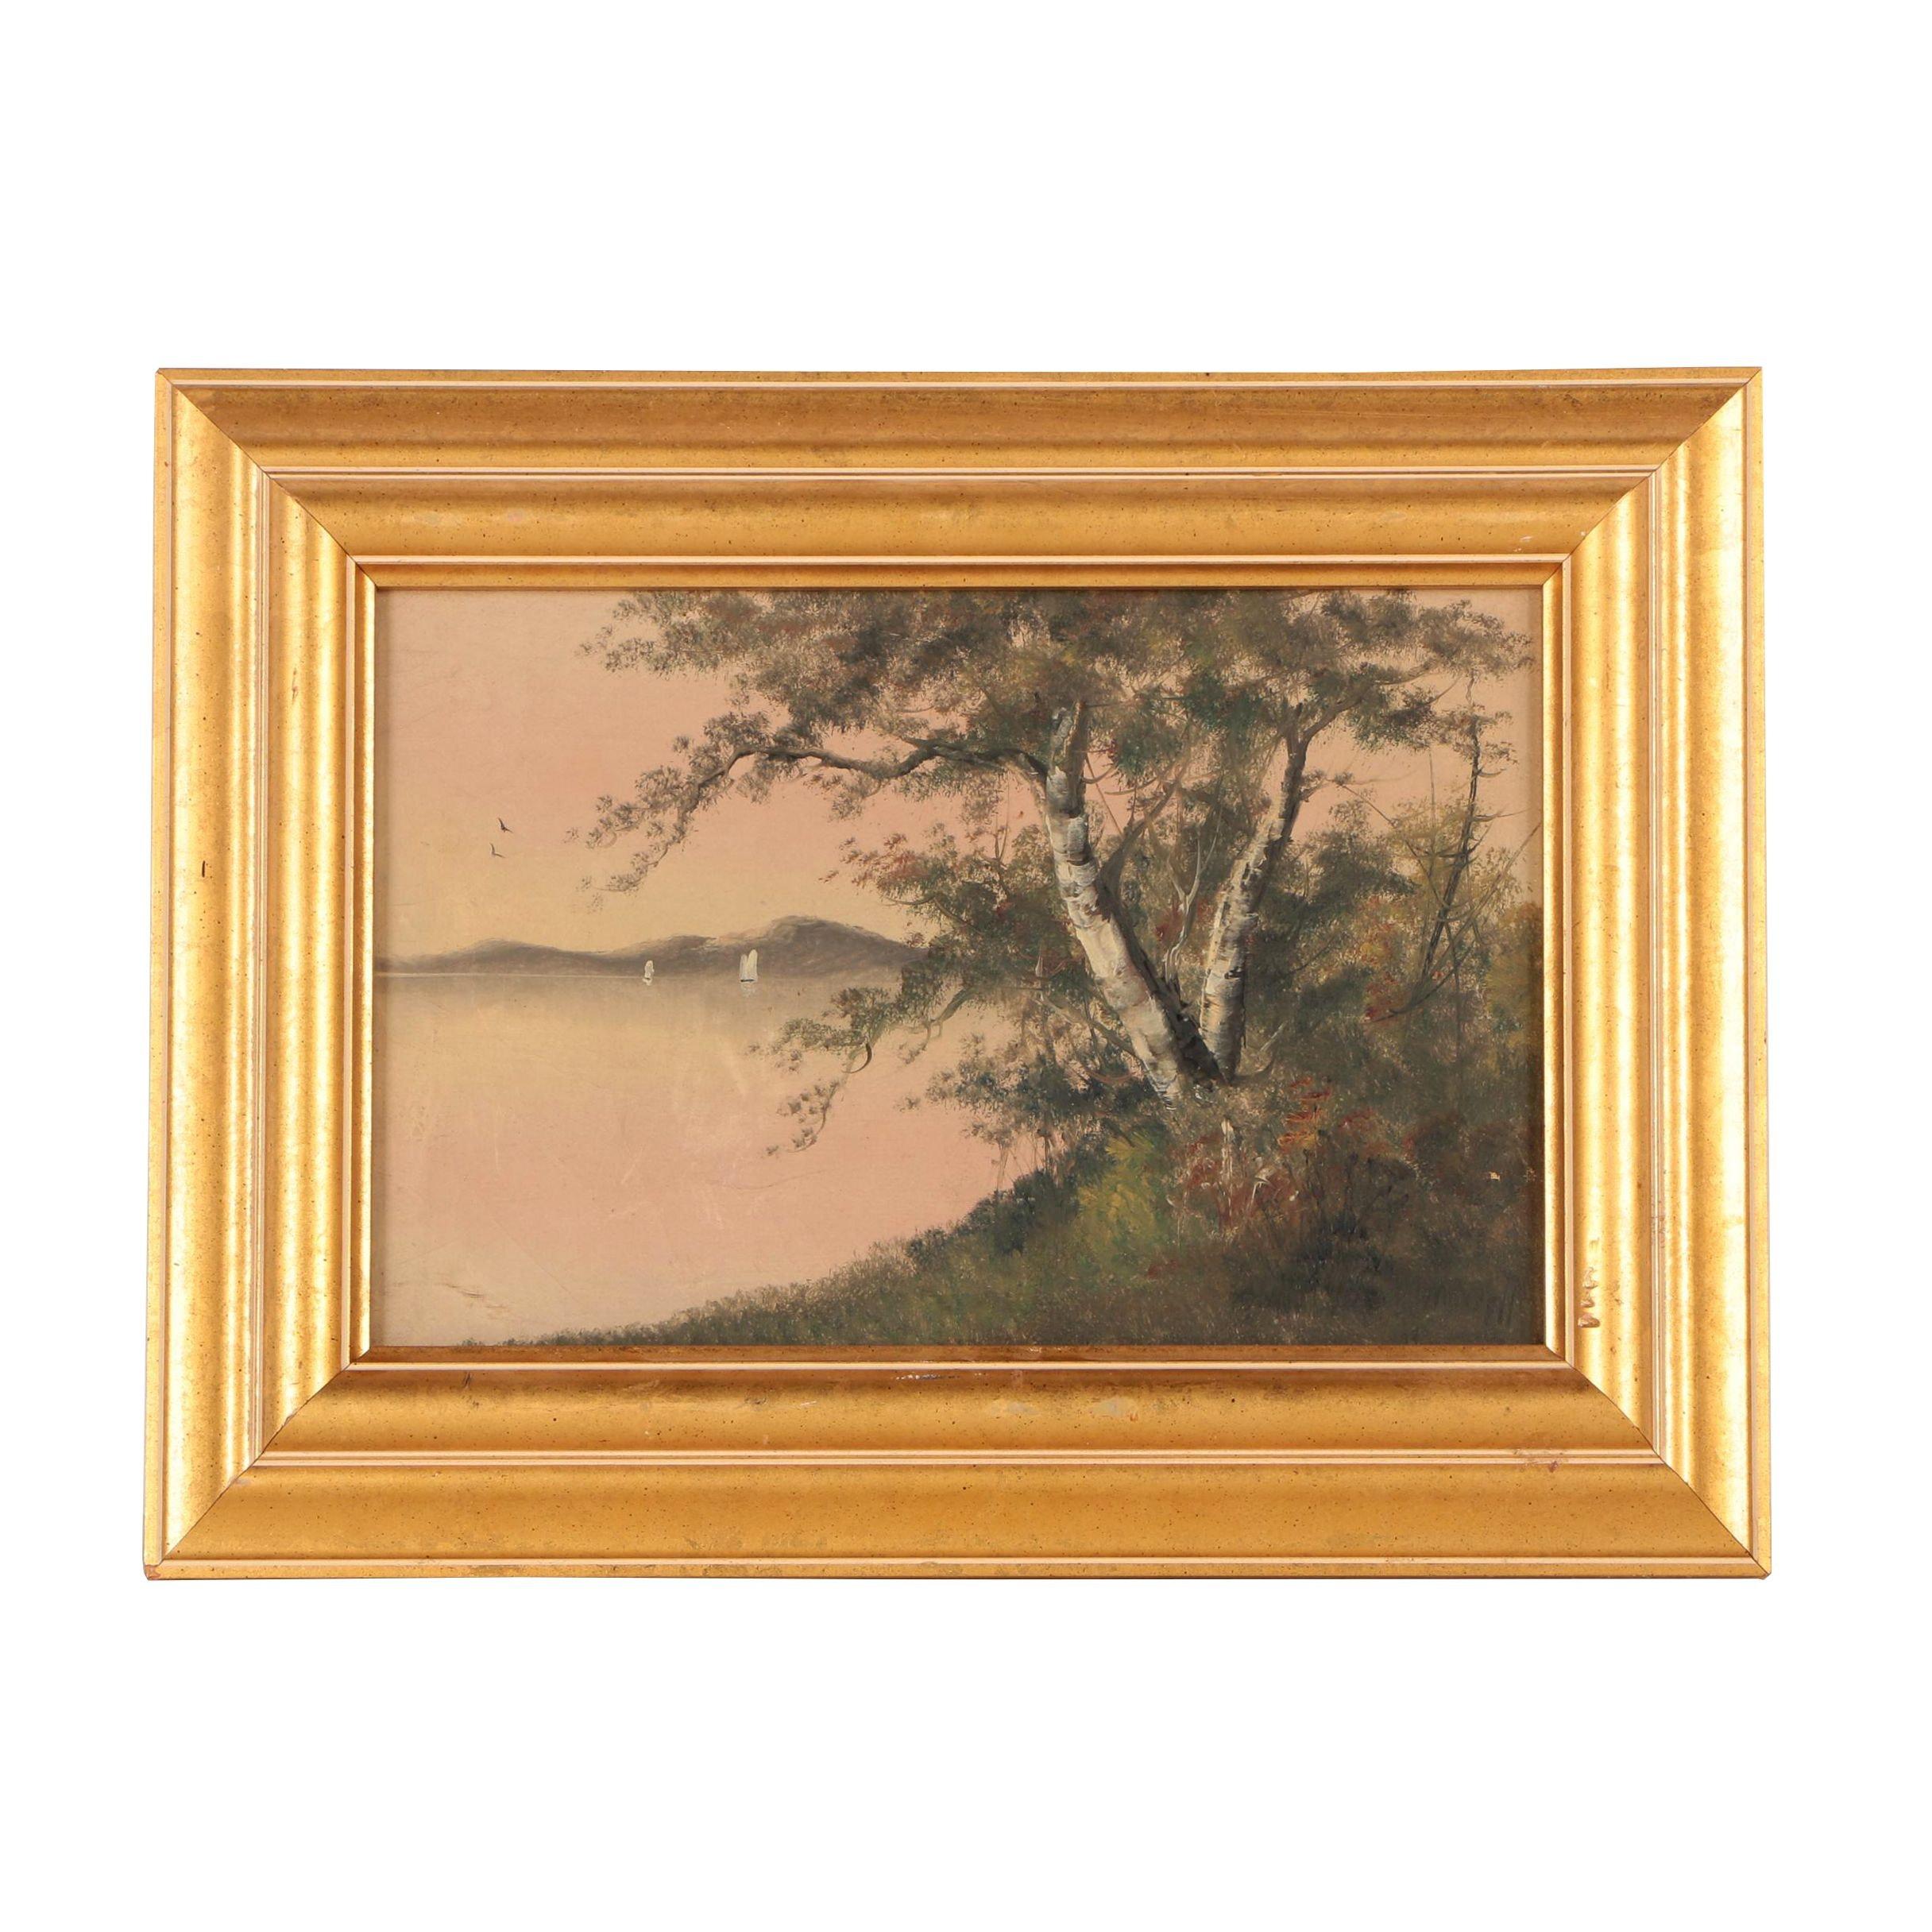 Morrell Landscape Oil Painting